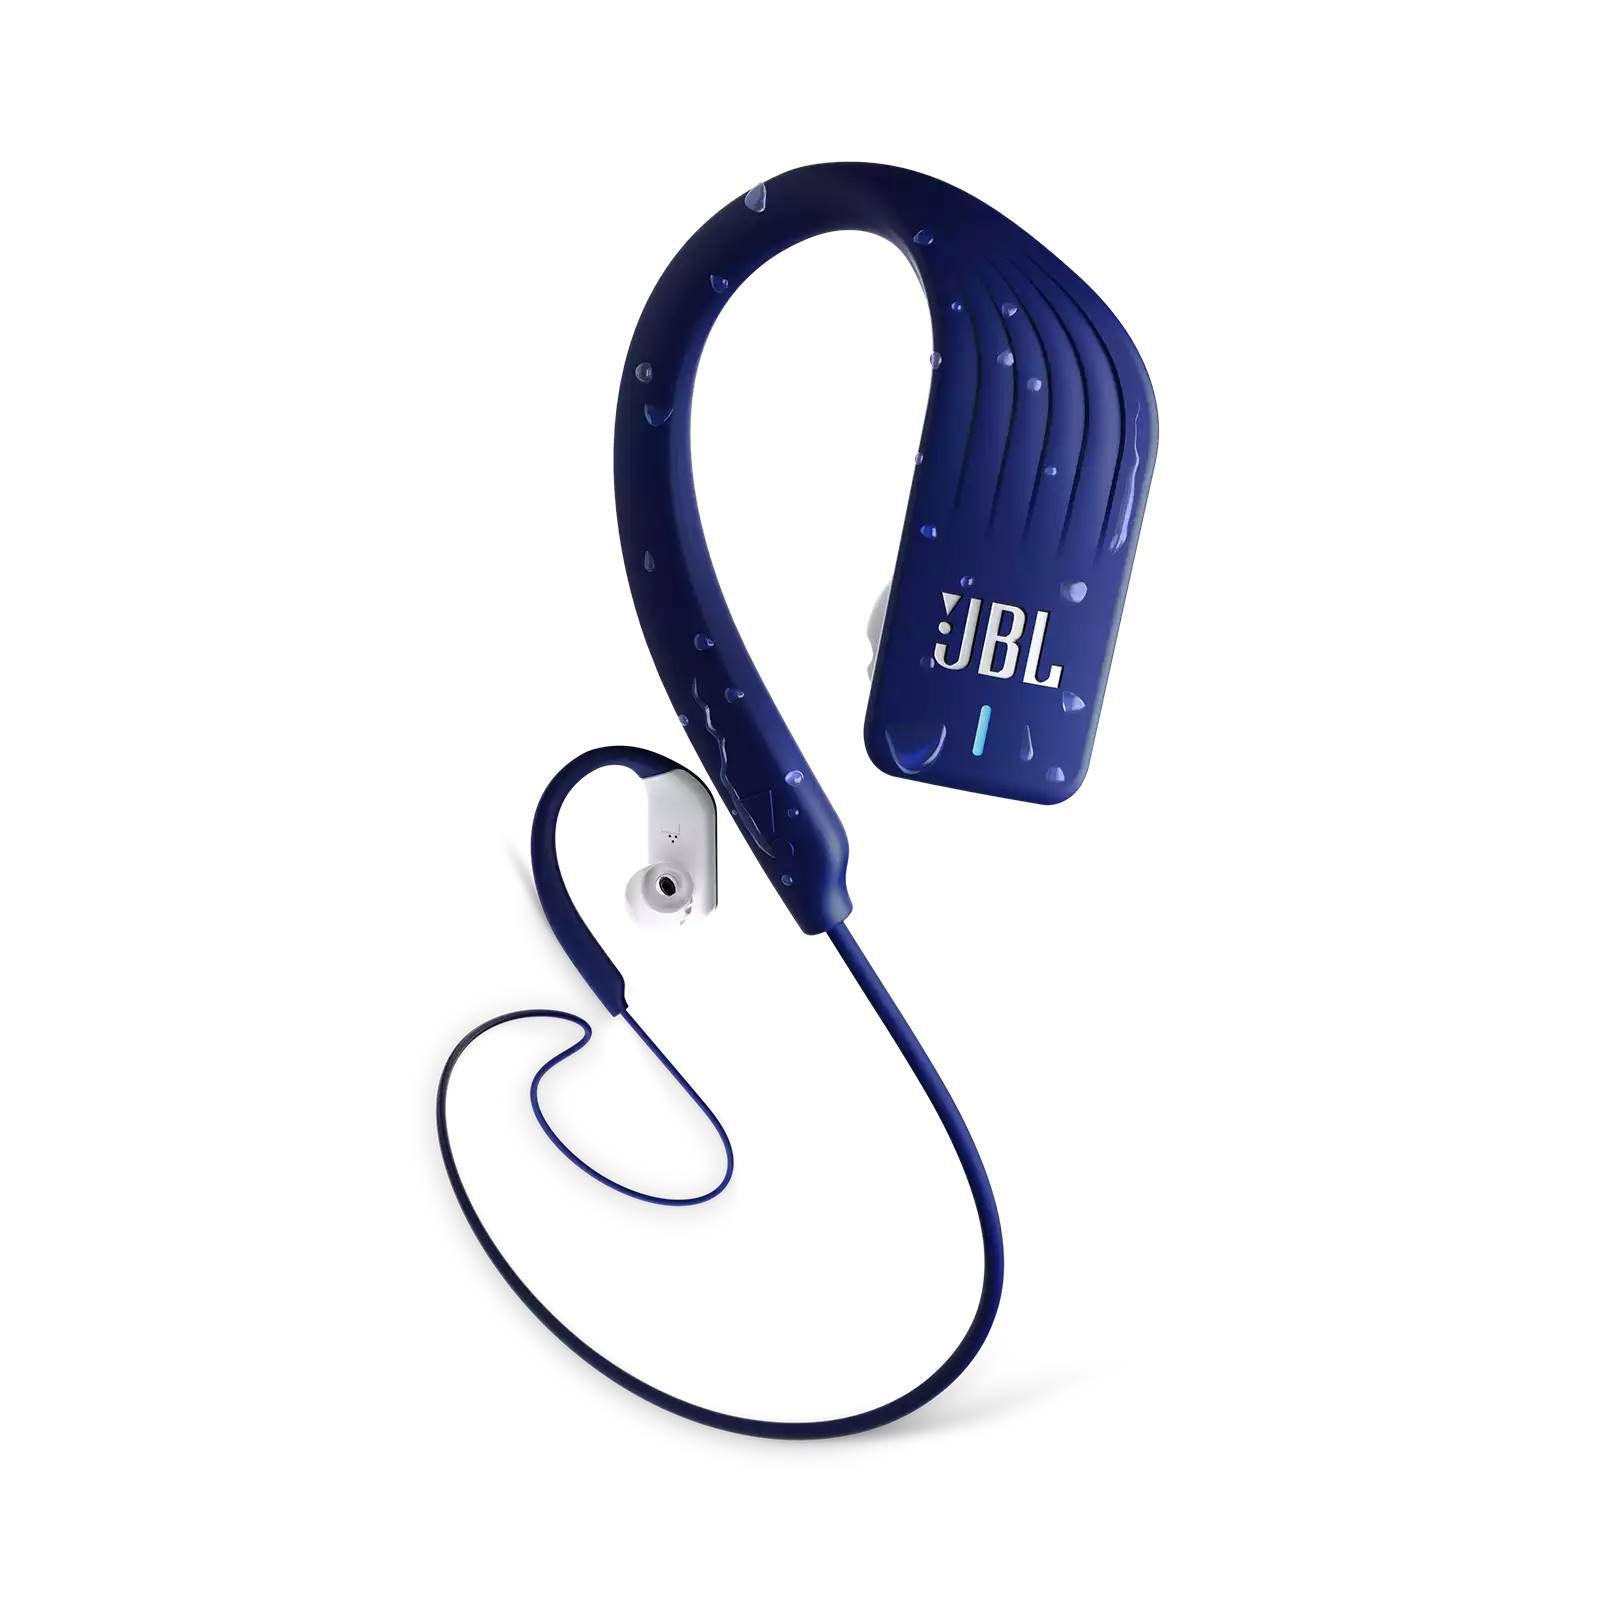 Fone de Ouvido Bluetooth JBL Endurance Sprint - Azul e Branco JBLENDURSPRINTBLU